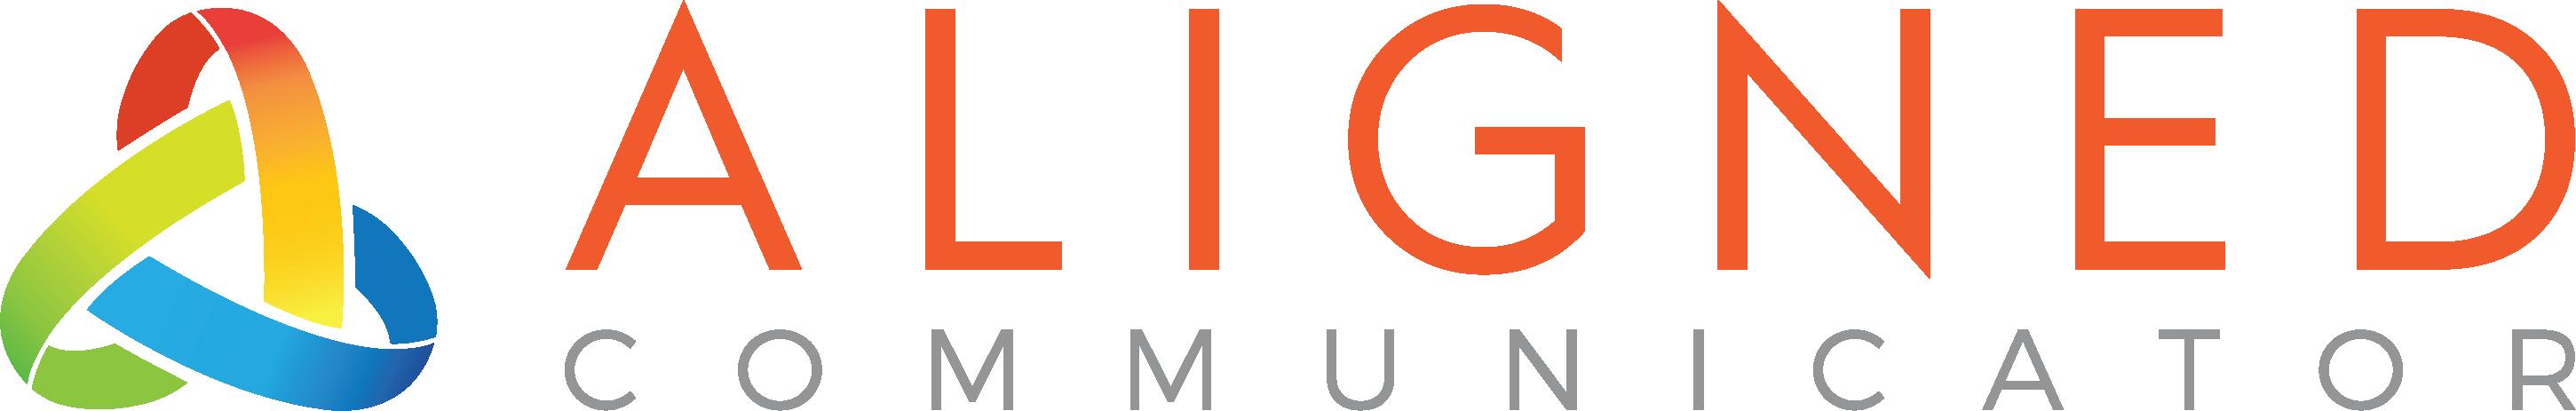 wall-street logo